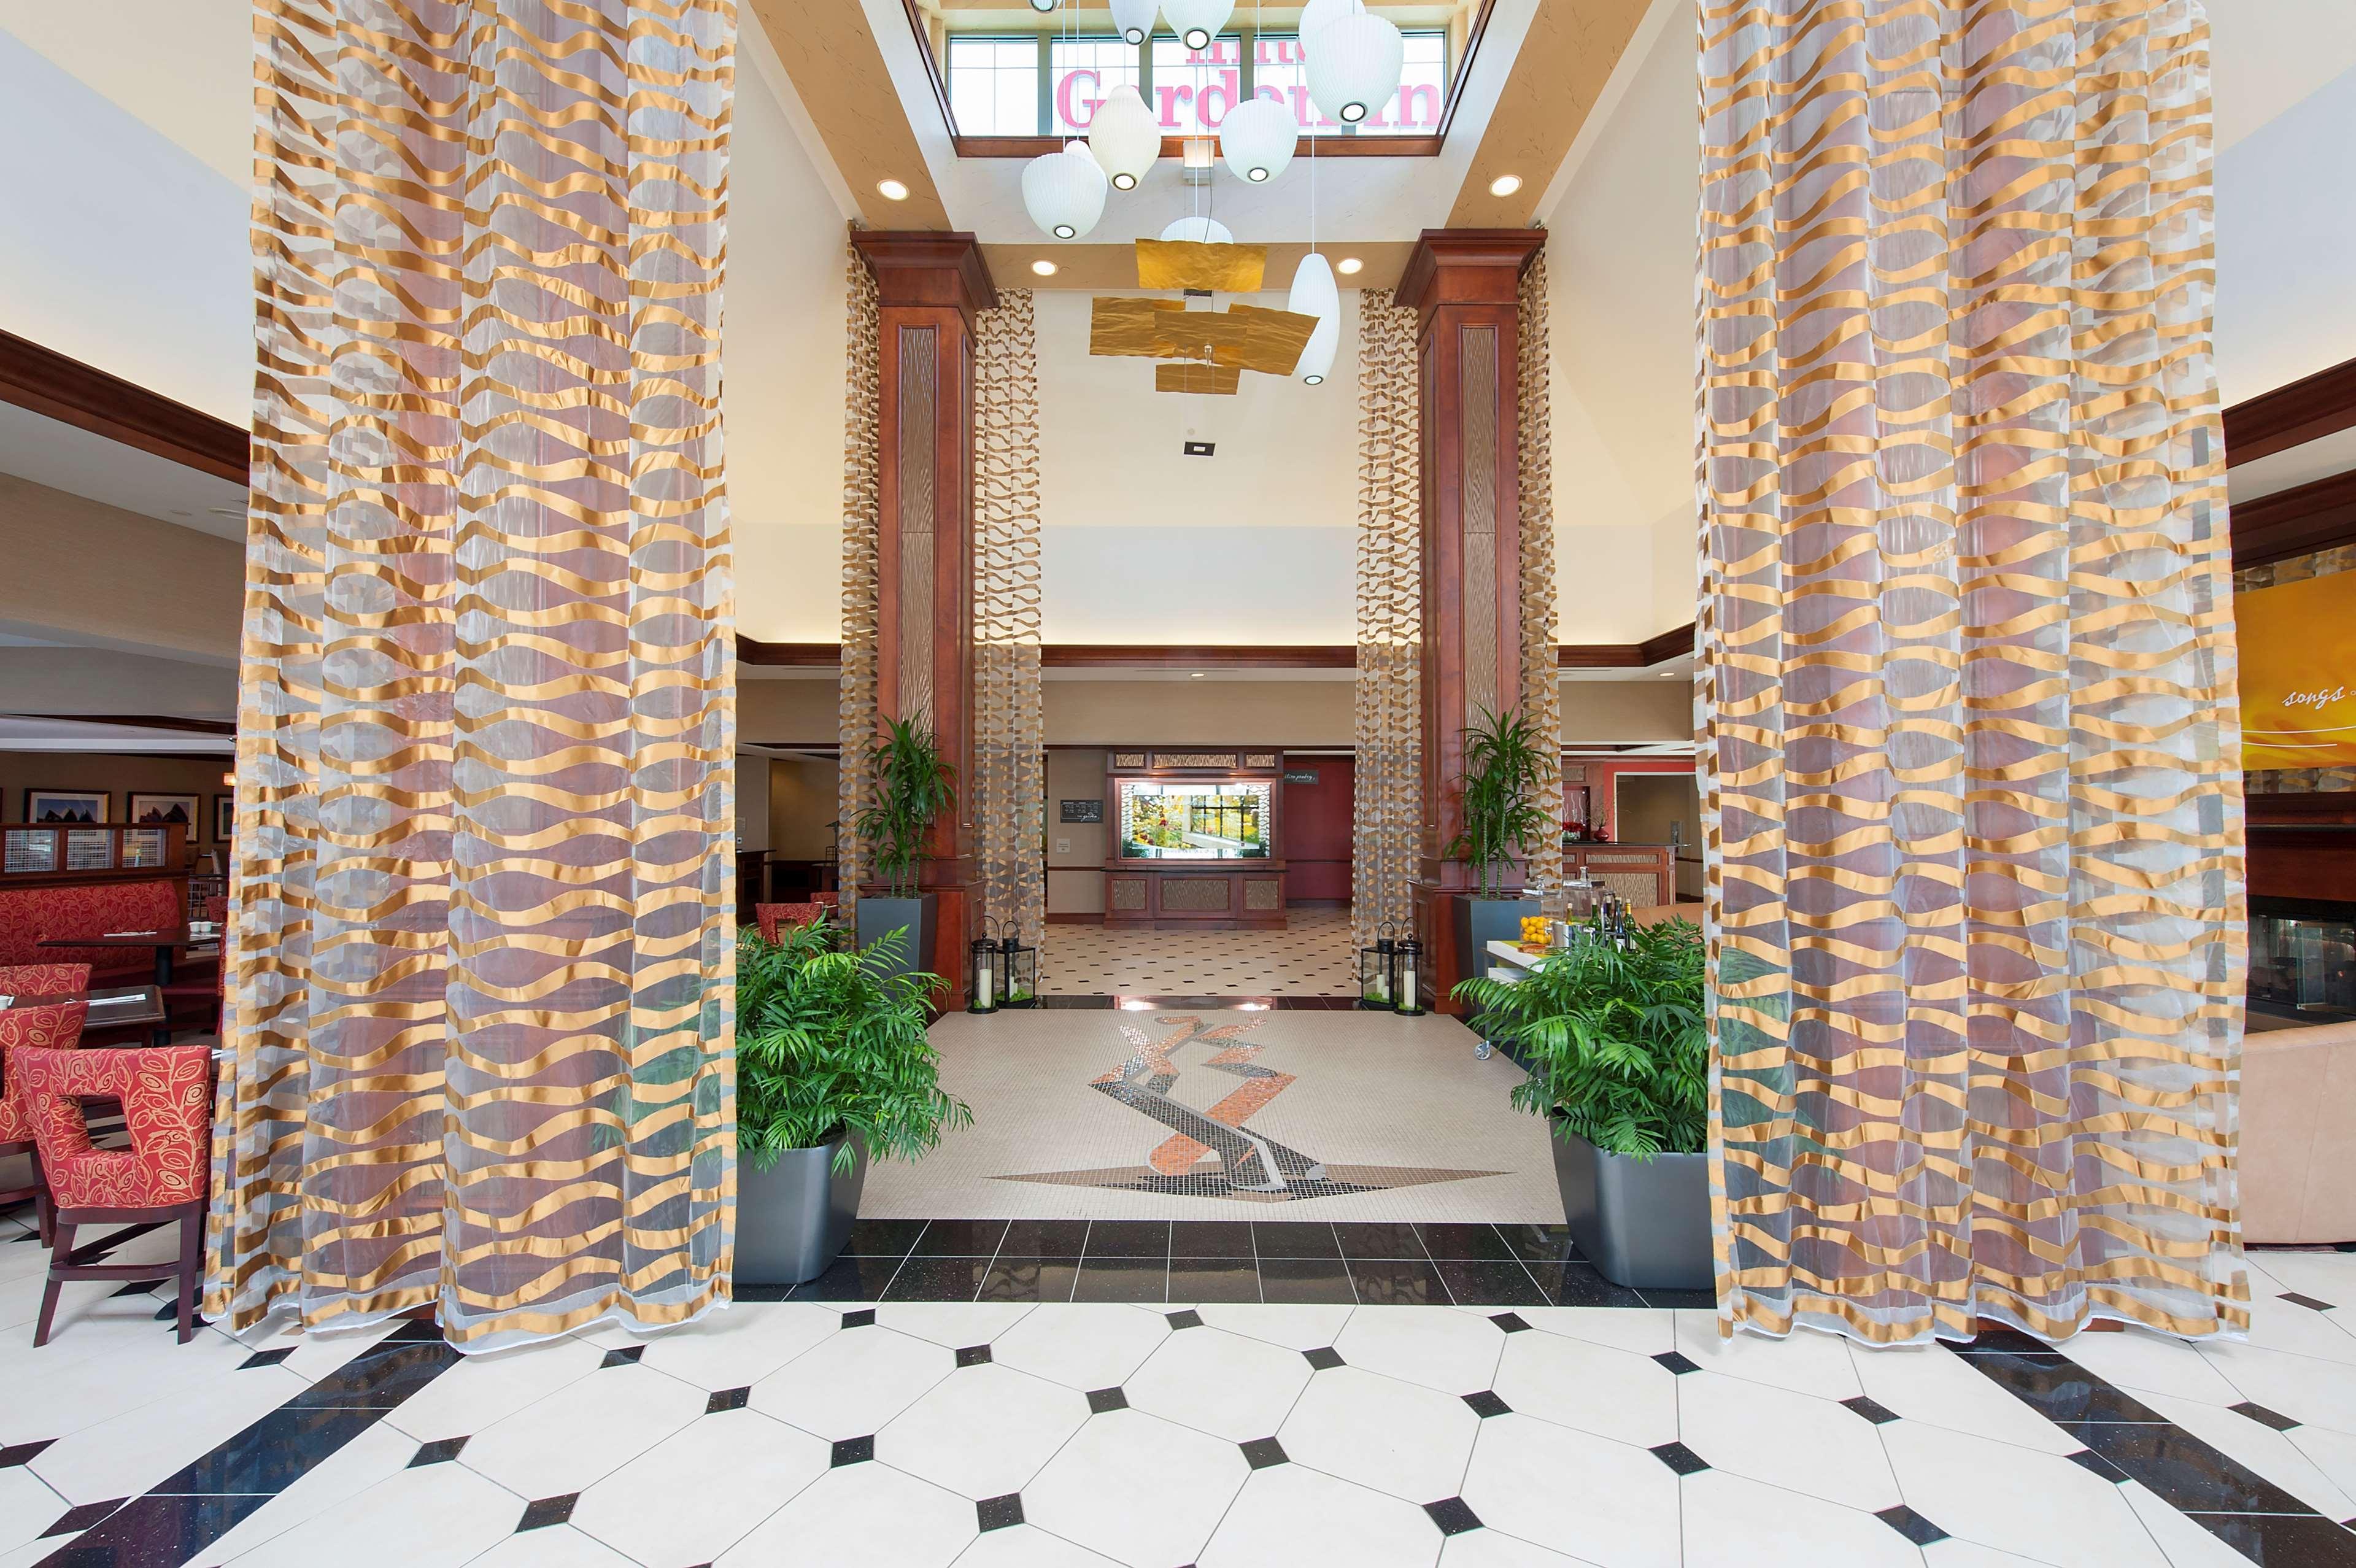 Hilton Garden Inn Indianapolis South/Greenwood image 6